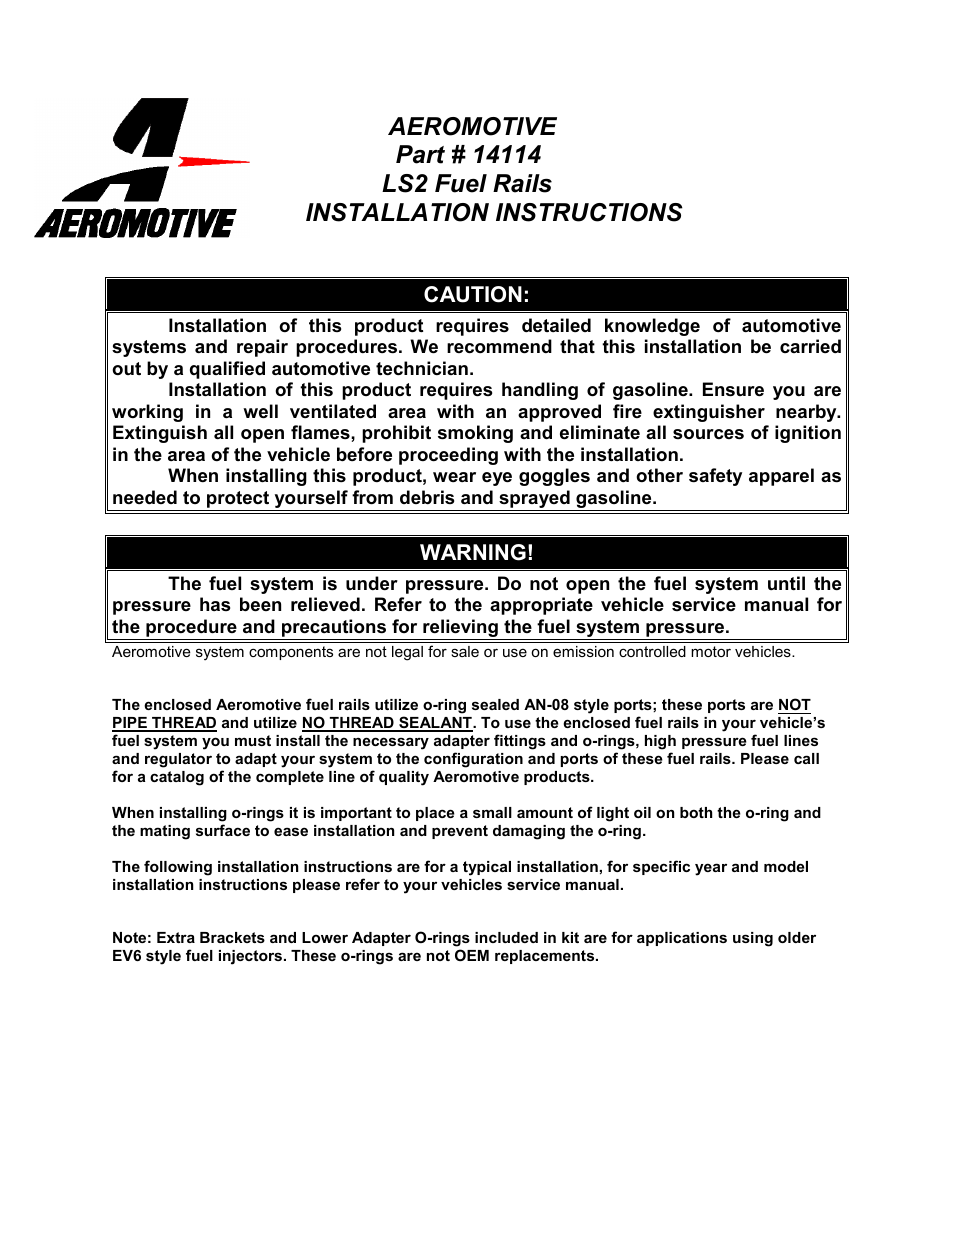 aeromotive 14114 05 06 gm ls2 fuel rail kit user manual 4 pages rh manualsdir com GM LS Engine in Chevy Colorado GM LT1 Engine